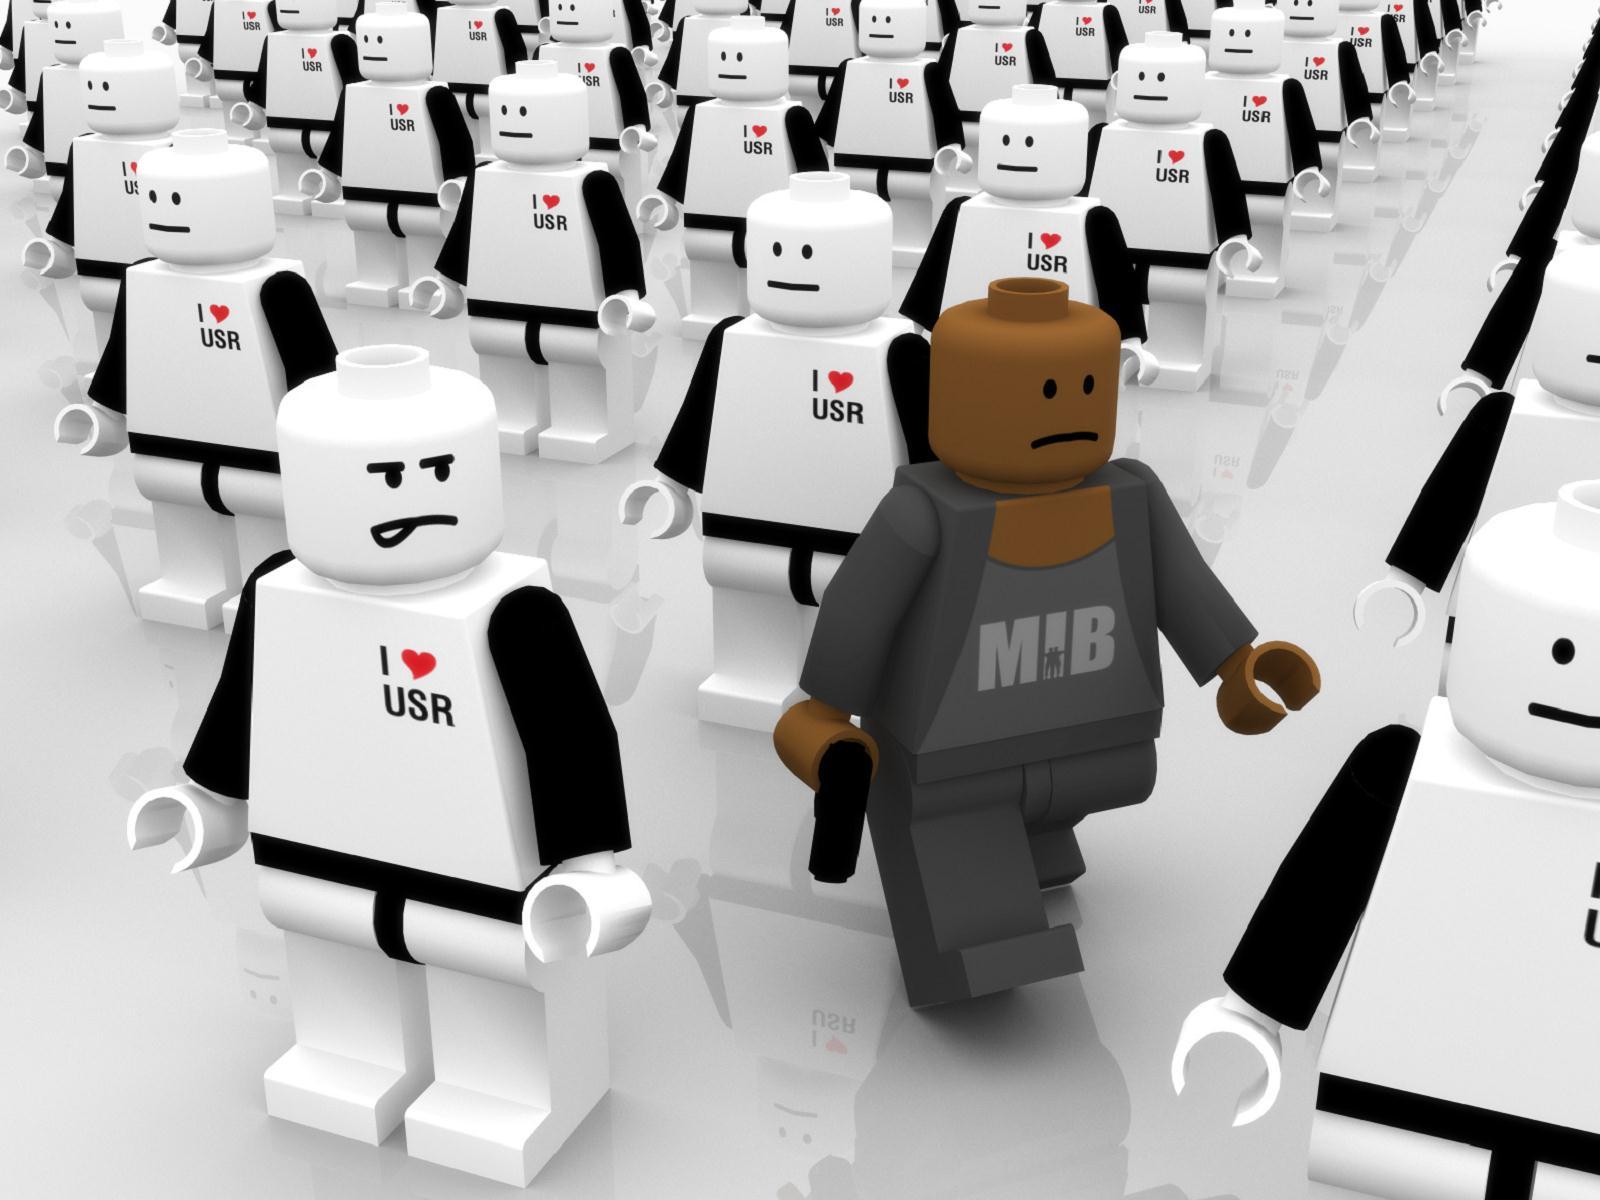 I,robot Lego